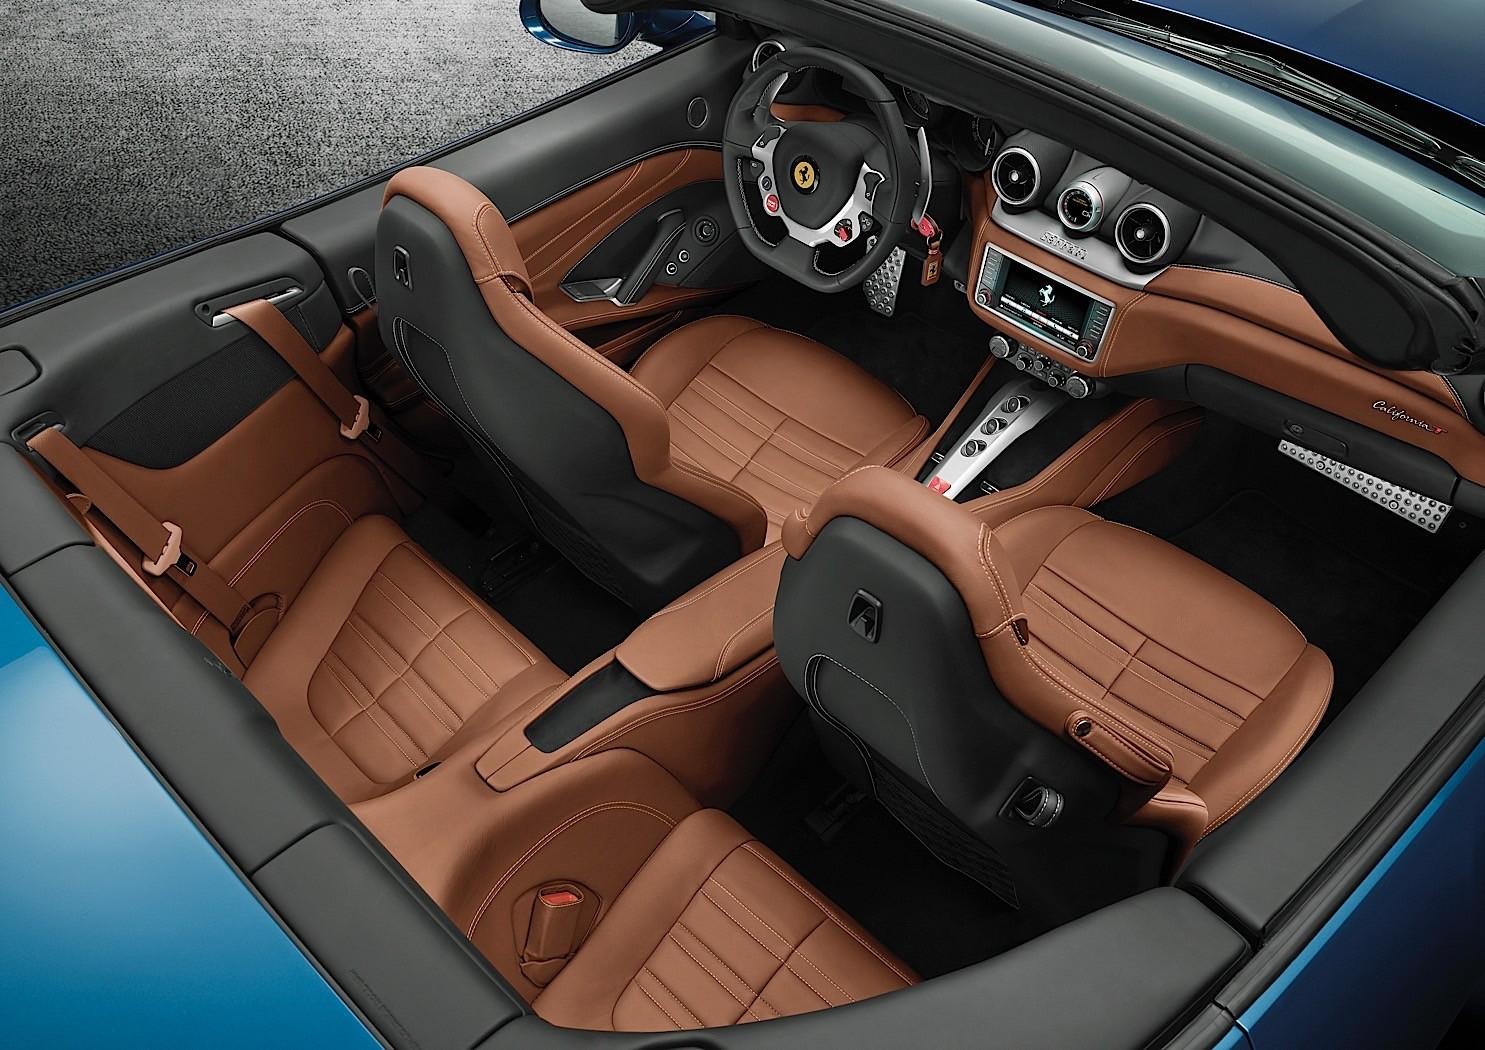 2017 ferrari california t review 50 فراری کالیفرنیا T مدل ۲۰۱۷ نقد و بررسی   اجاره ماشین